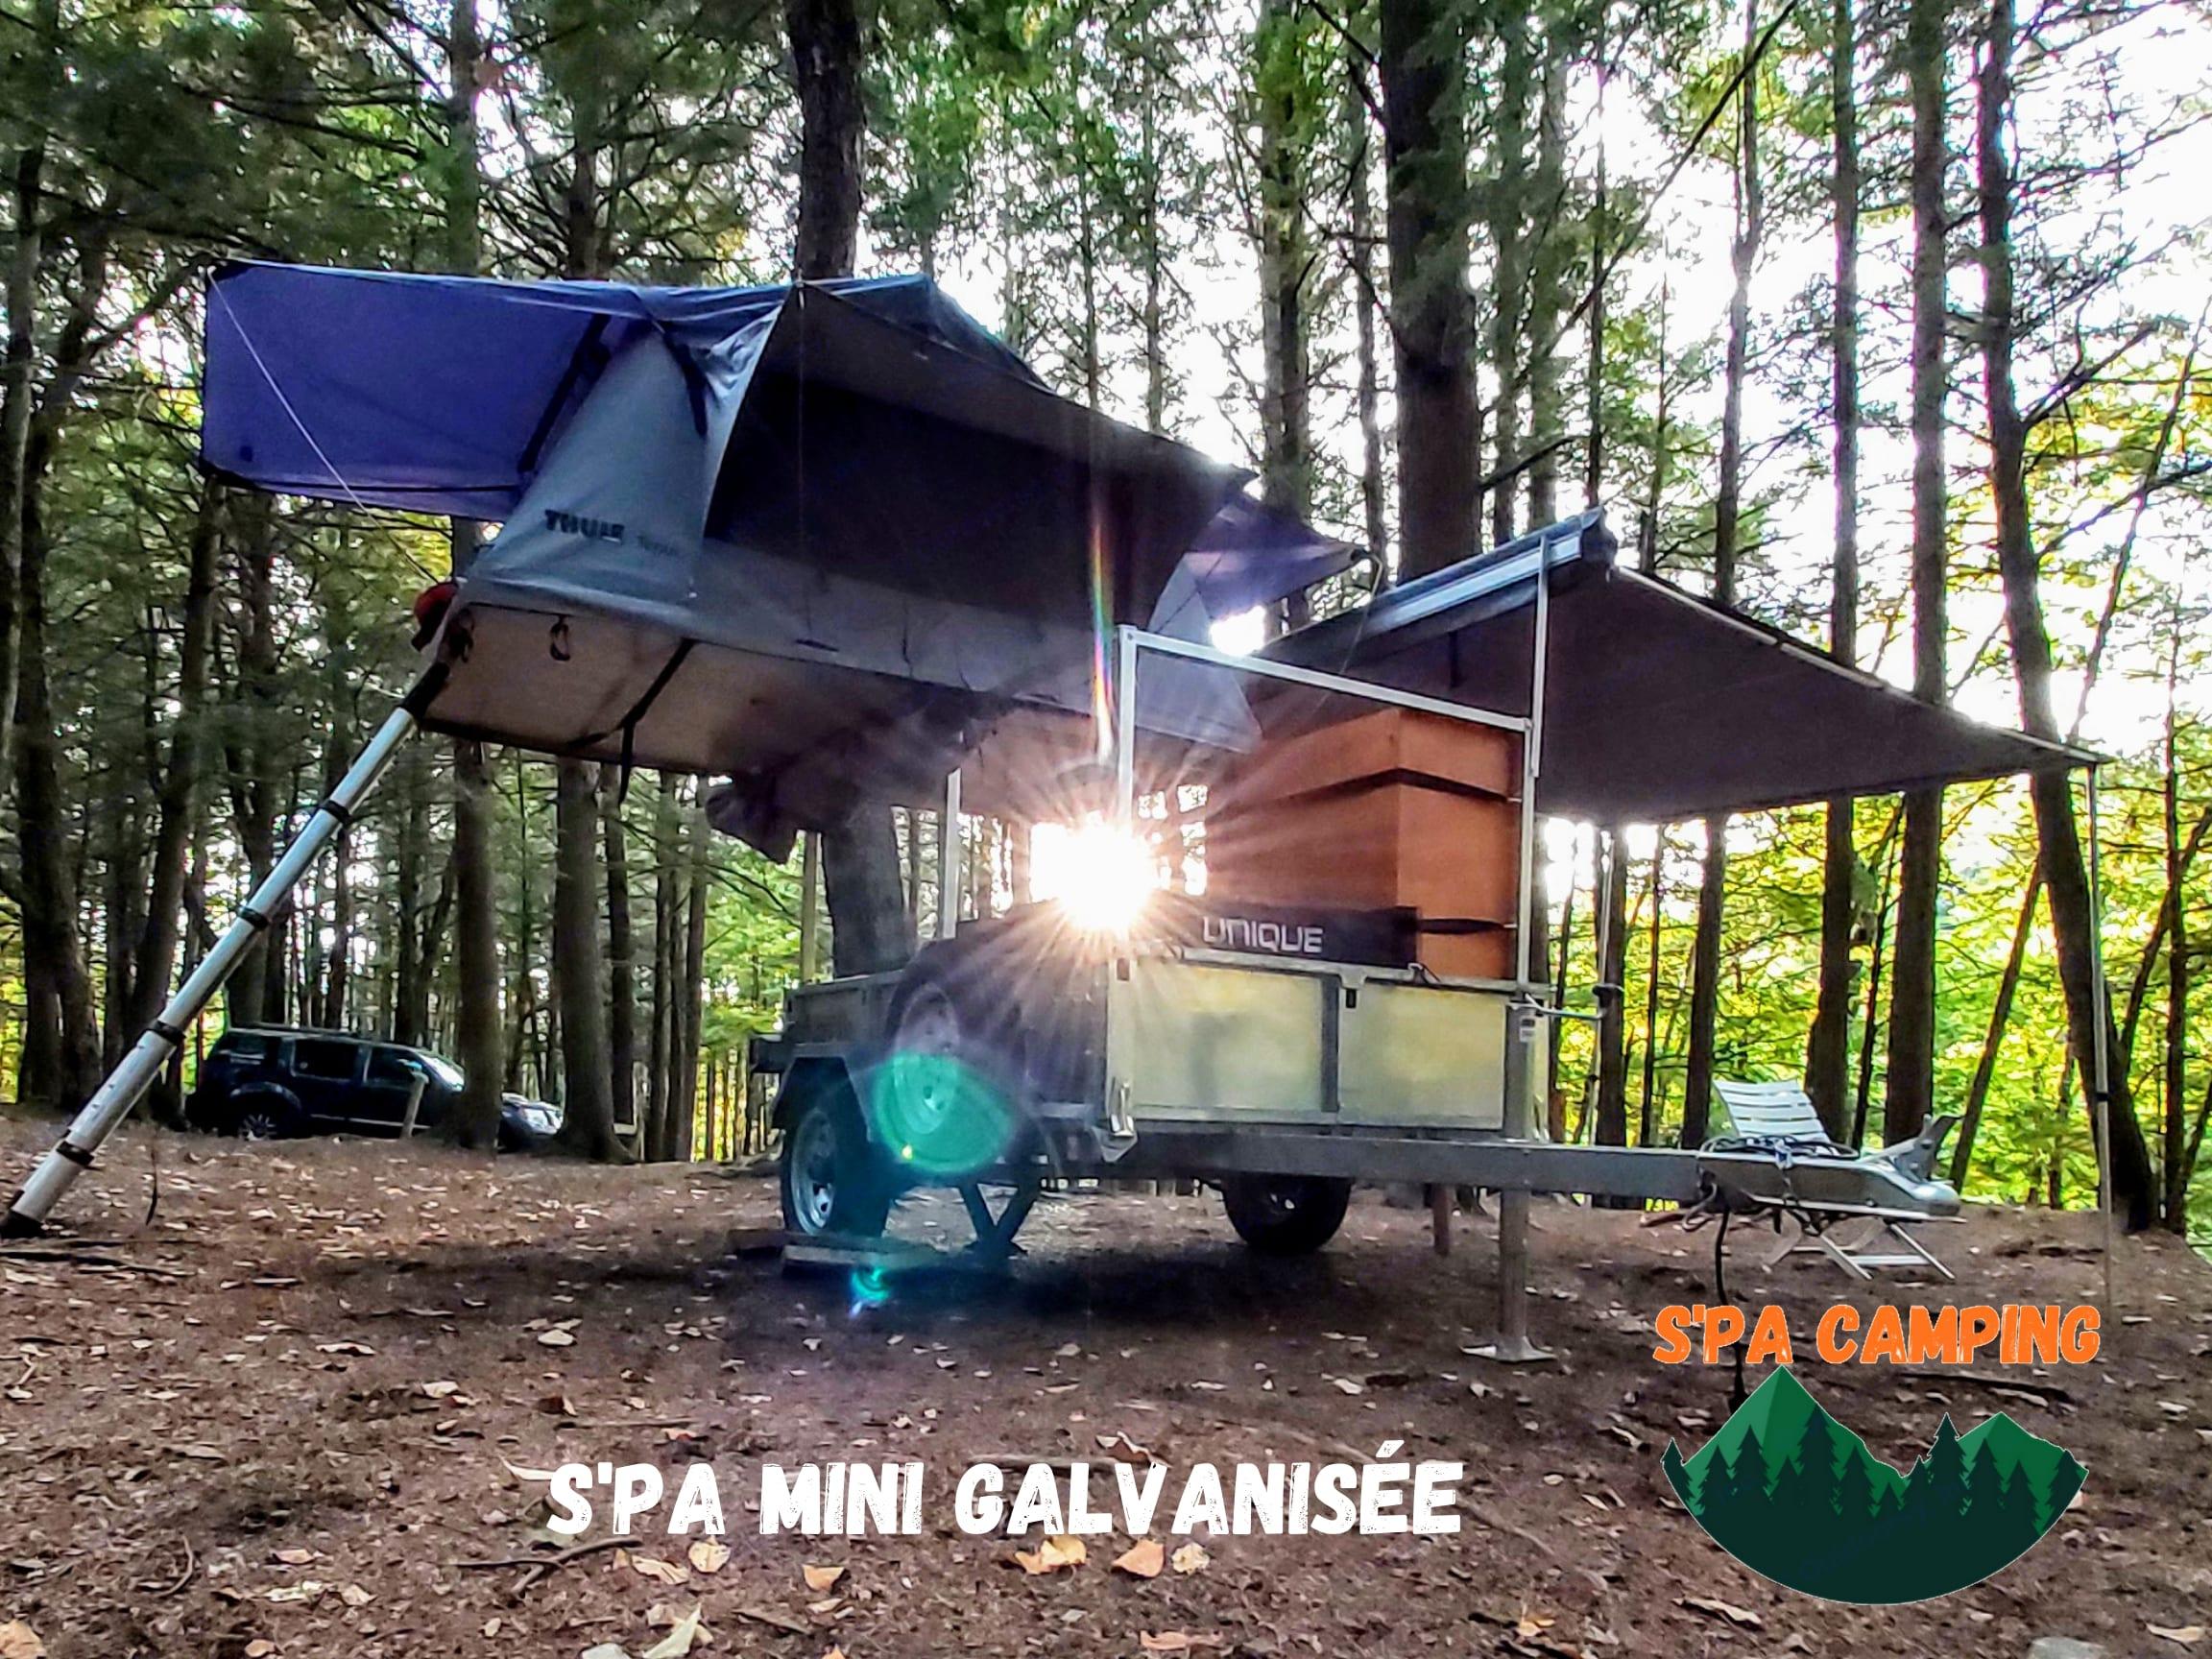 S'PA camping mini galvanisée 2021